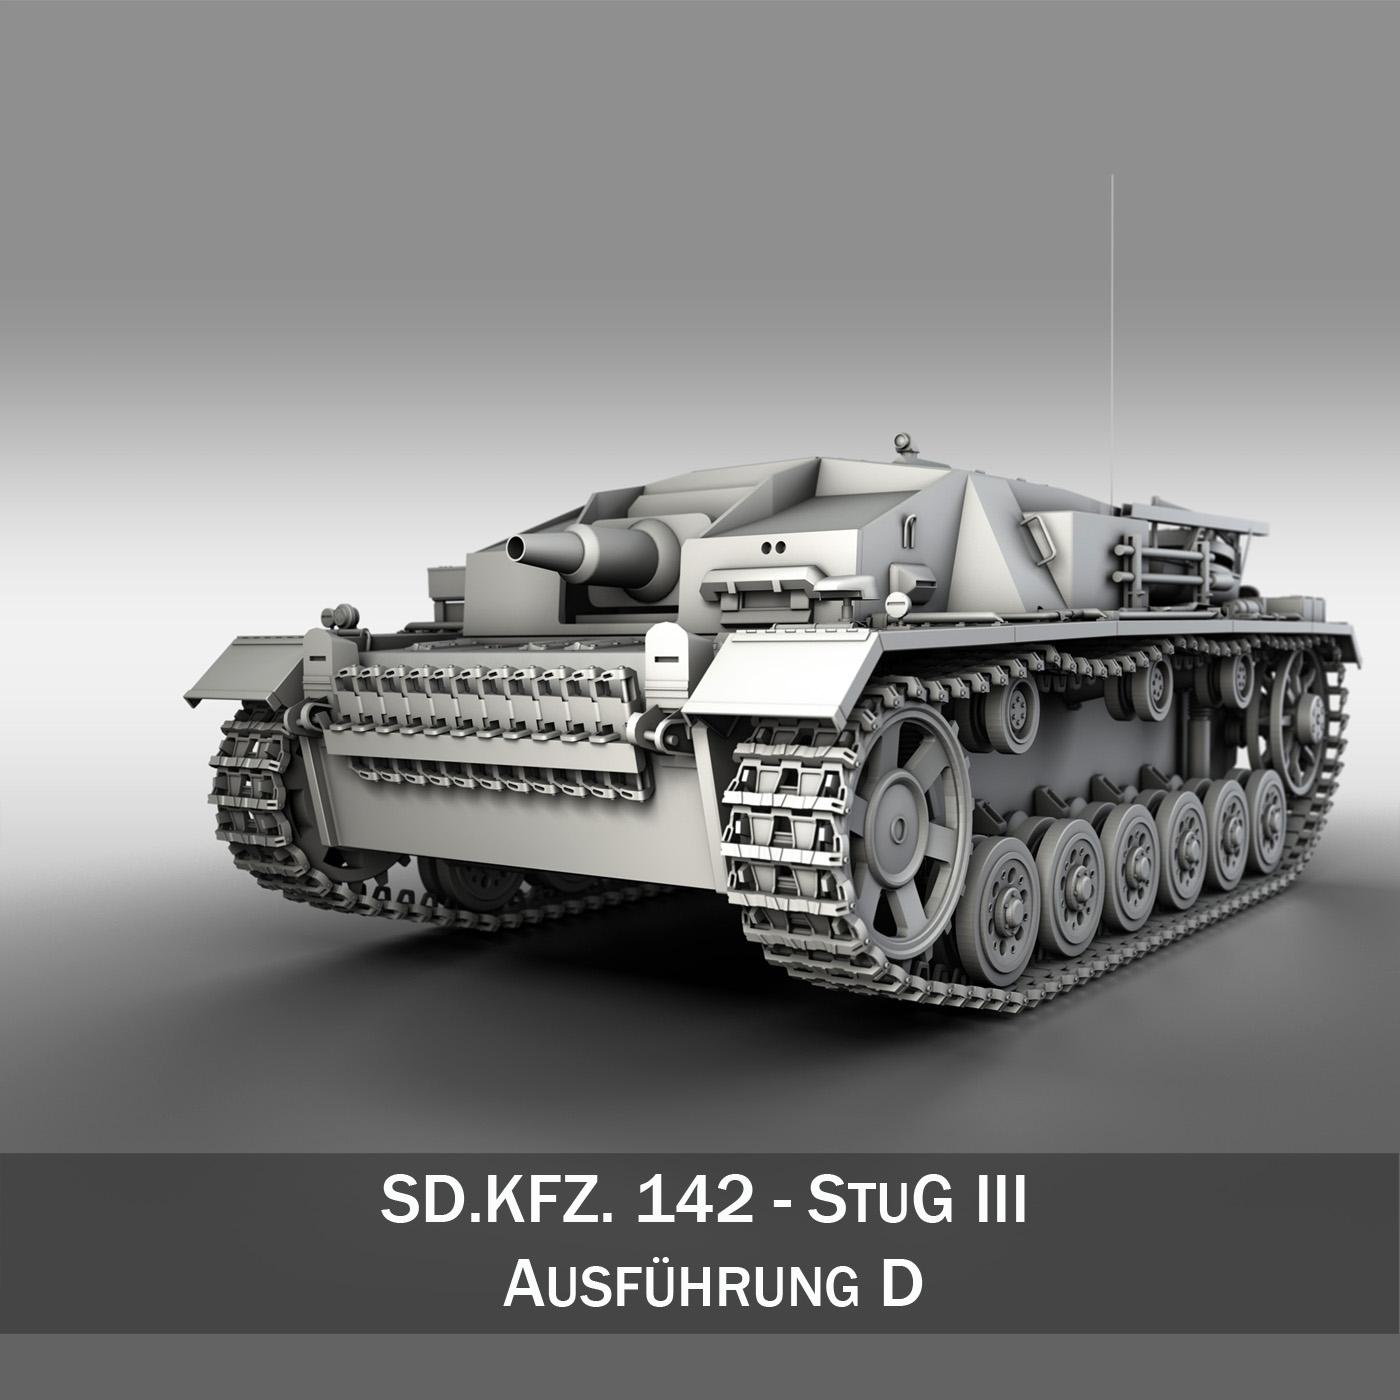 sdkfz. 142 - stug 3 - ausf.d 3d загвар 3ds fbx c4d lwo obj 251608